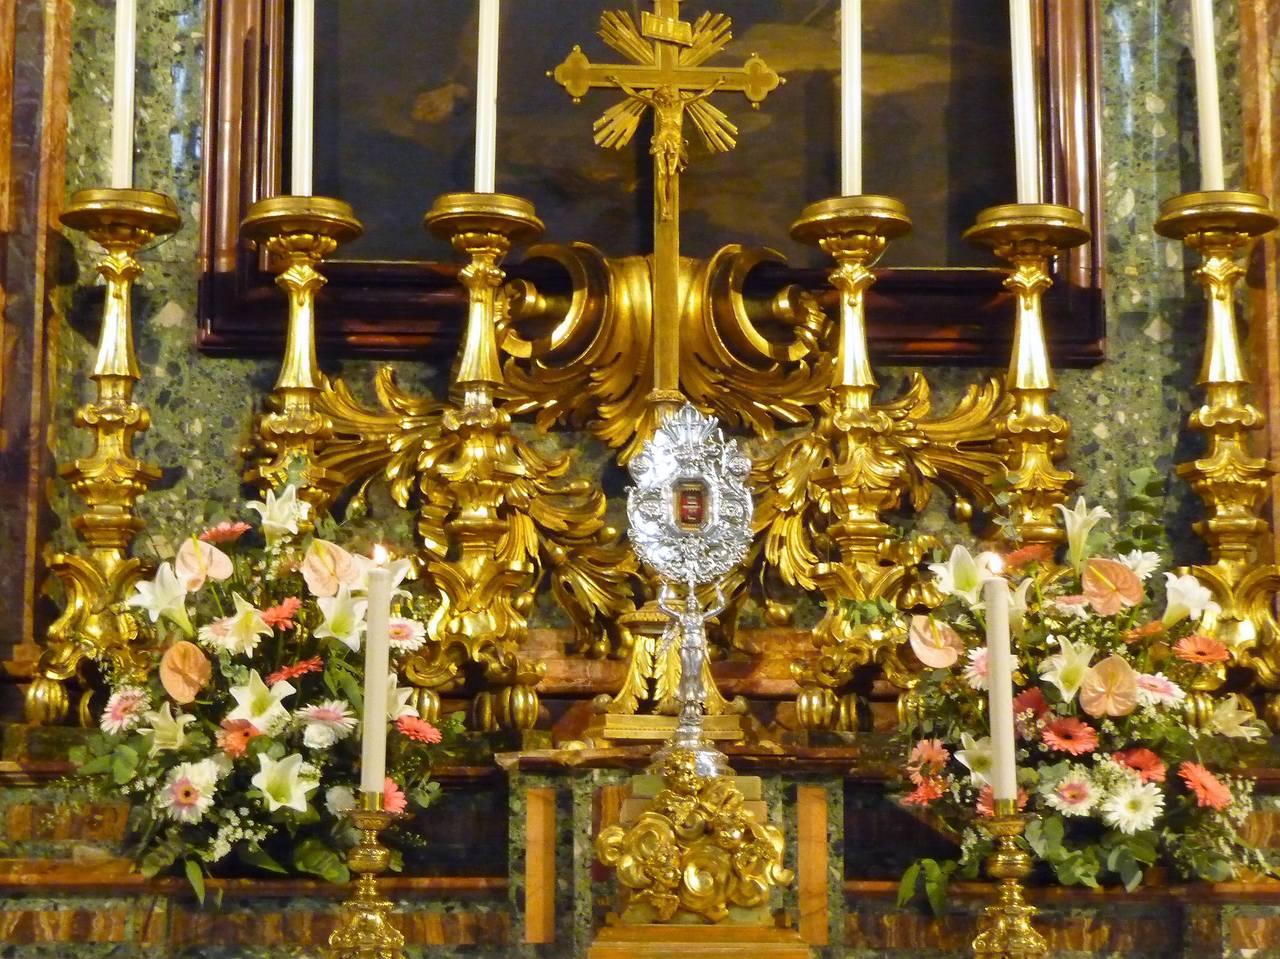 Chiesa S. Maria in Aracoeli (27)